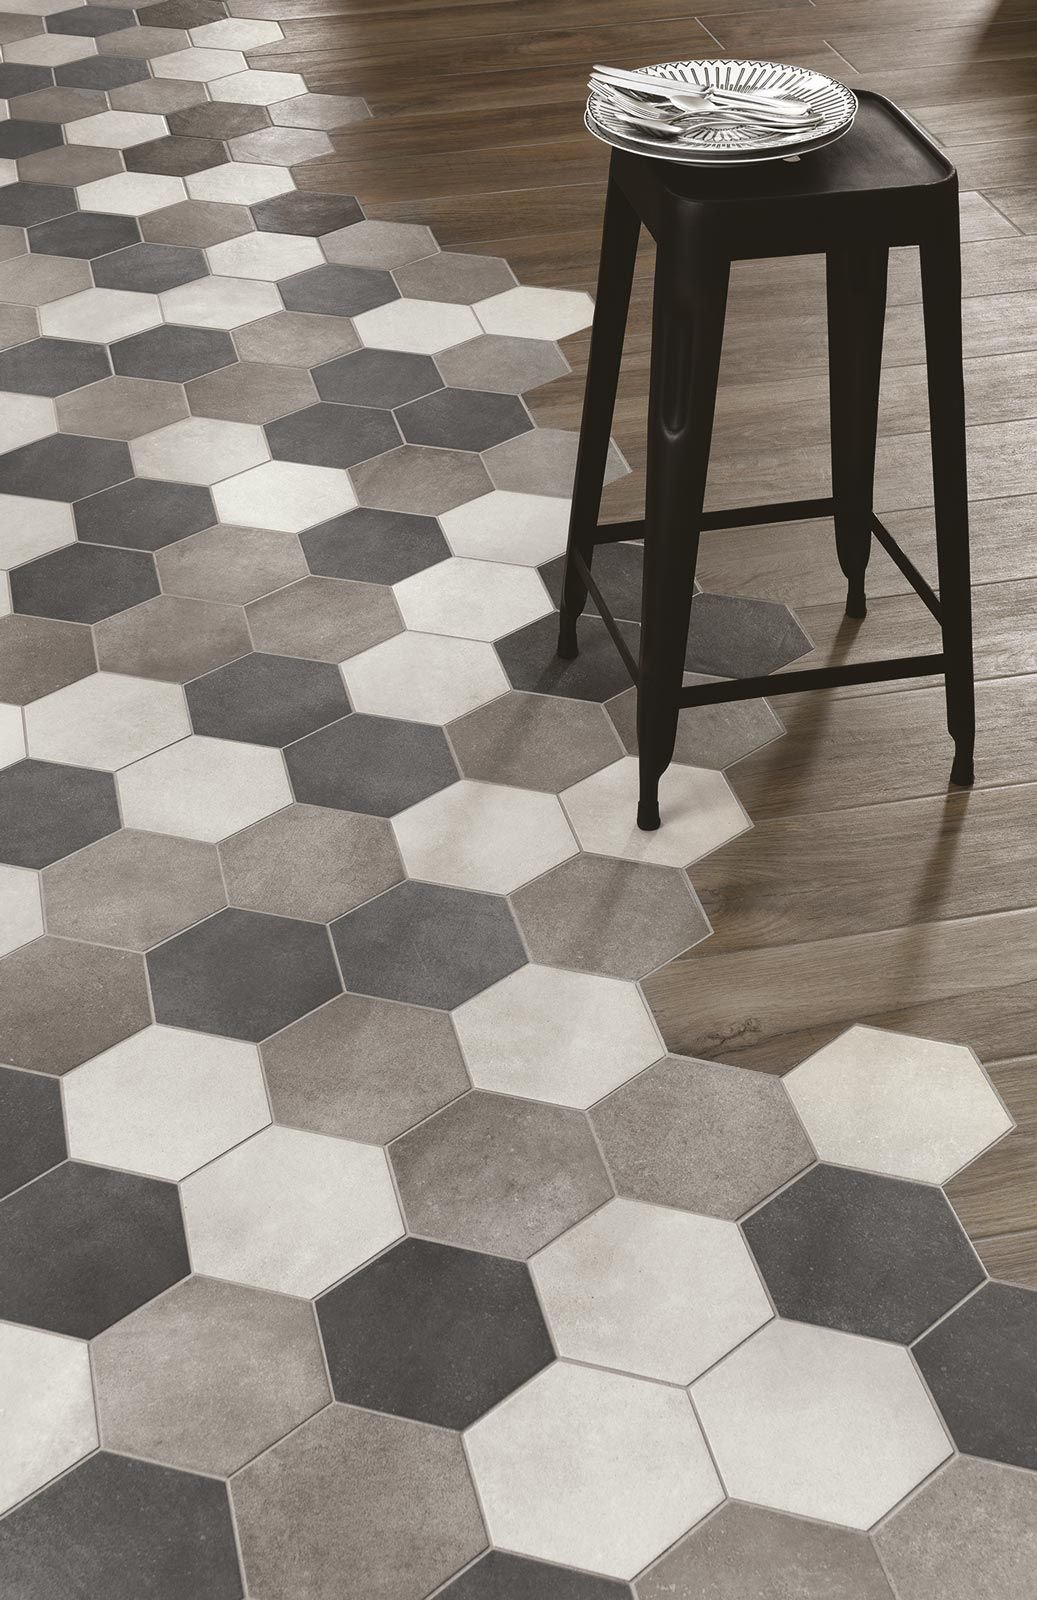 Cool Kitchen Floor Ideas Kuhlen Kuchenboden Ideen Haus